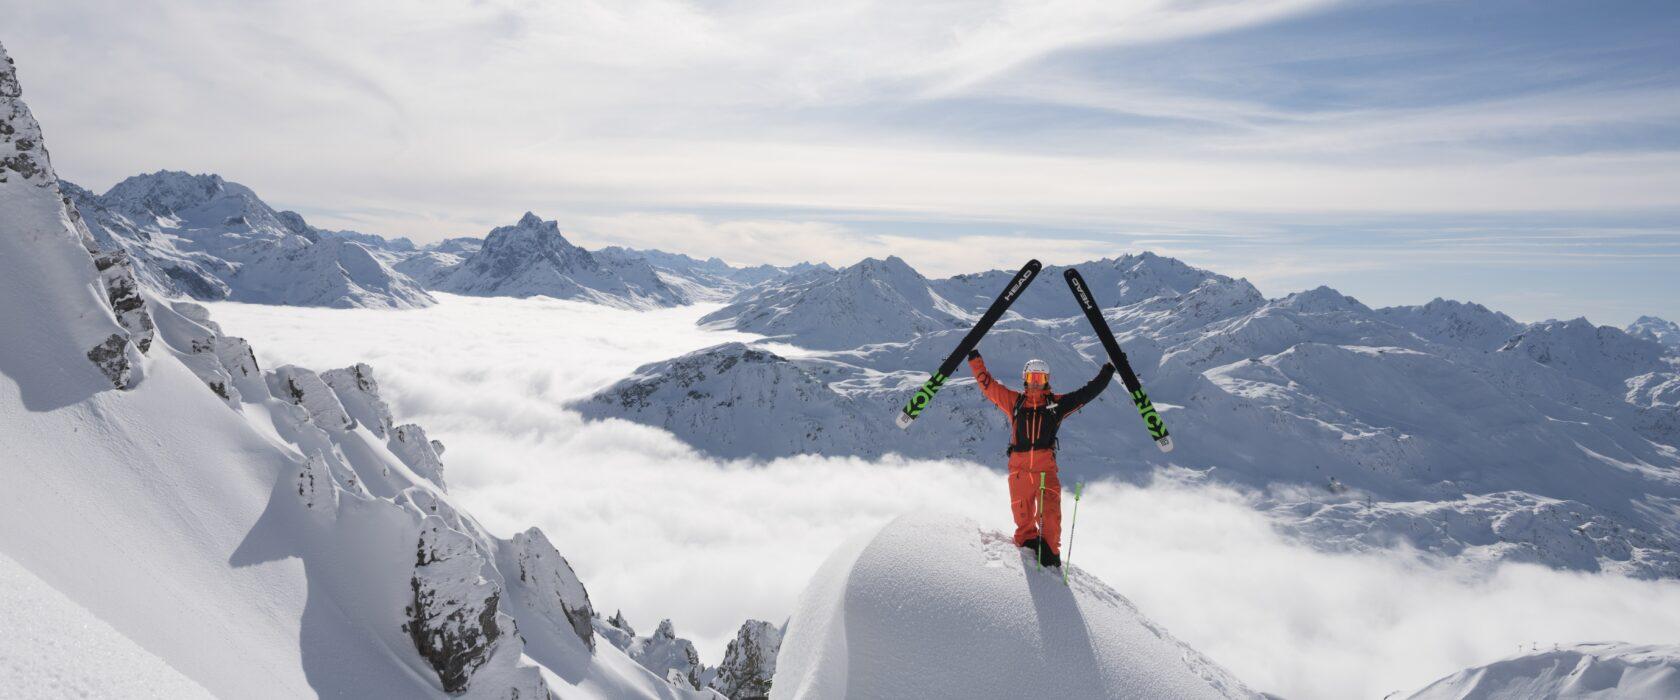 arlberg ski